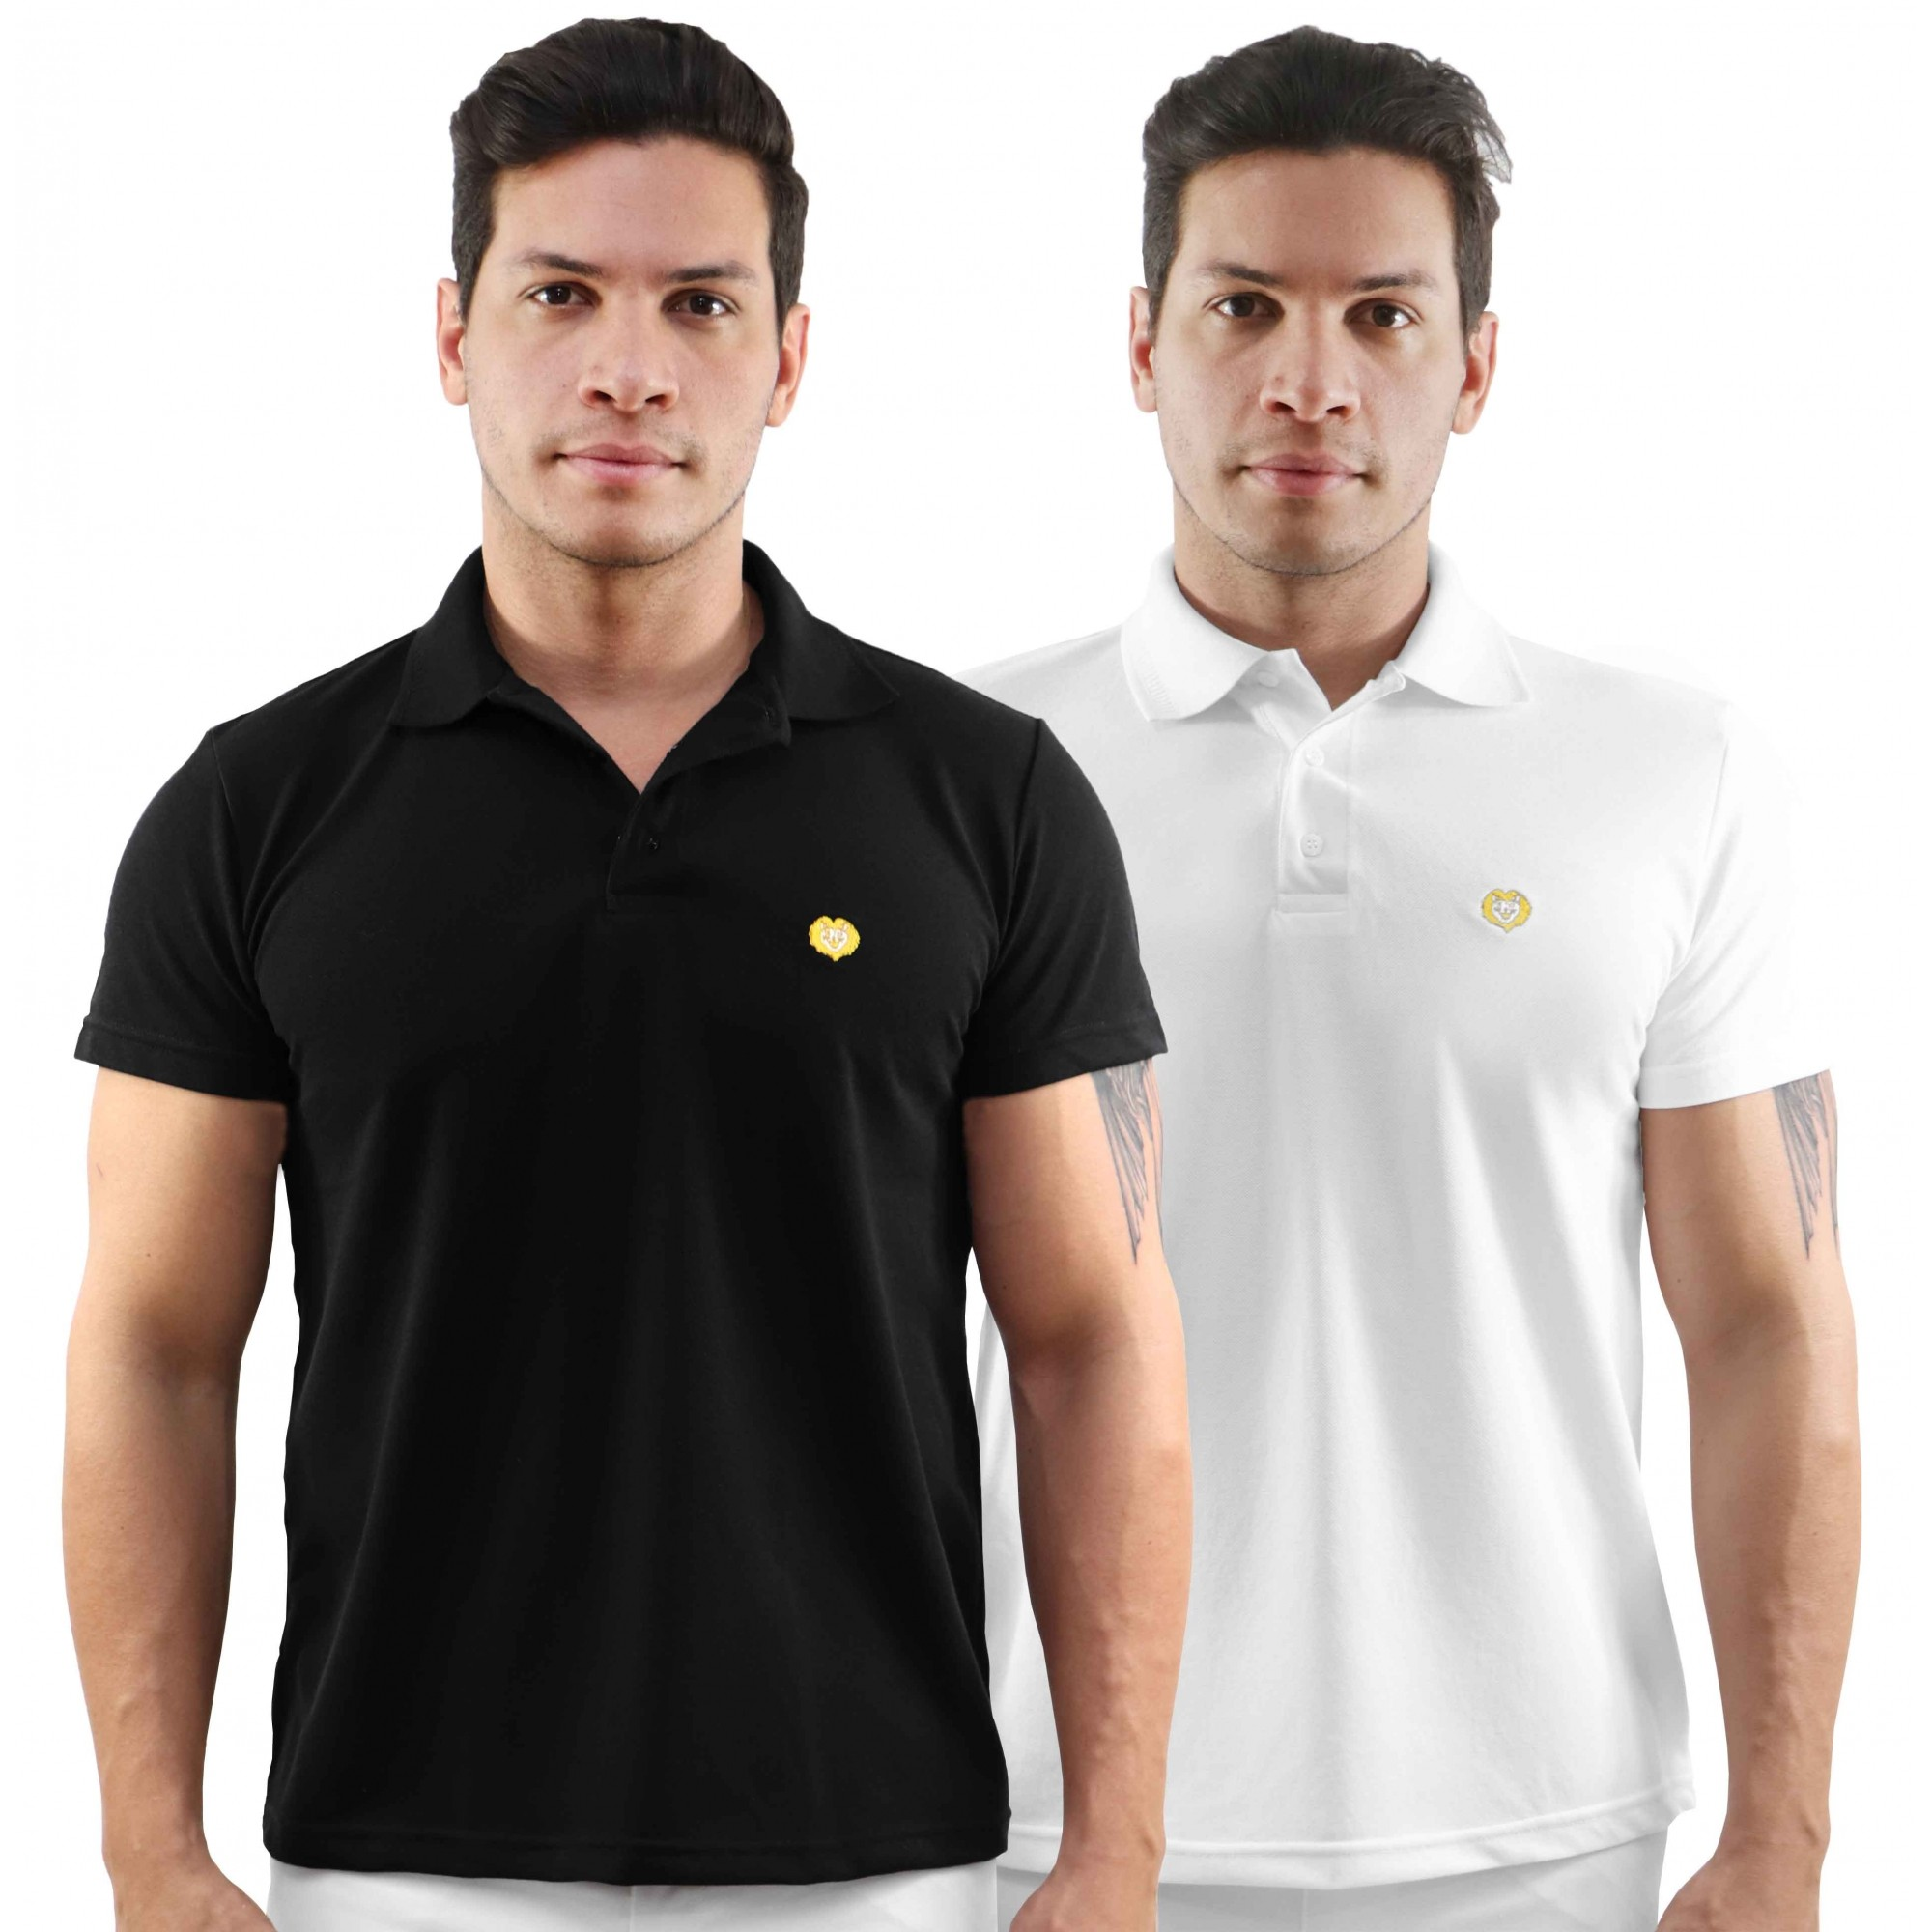 Camisa masculina Polo Leão